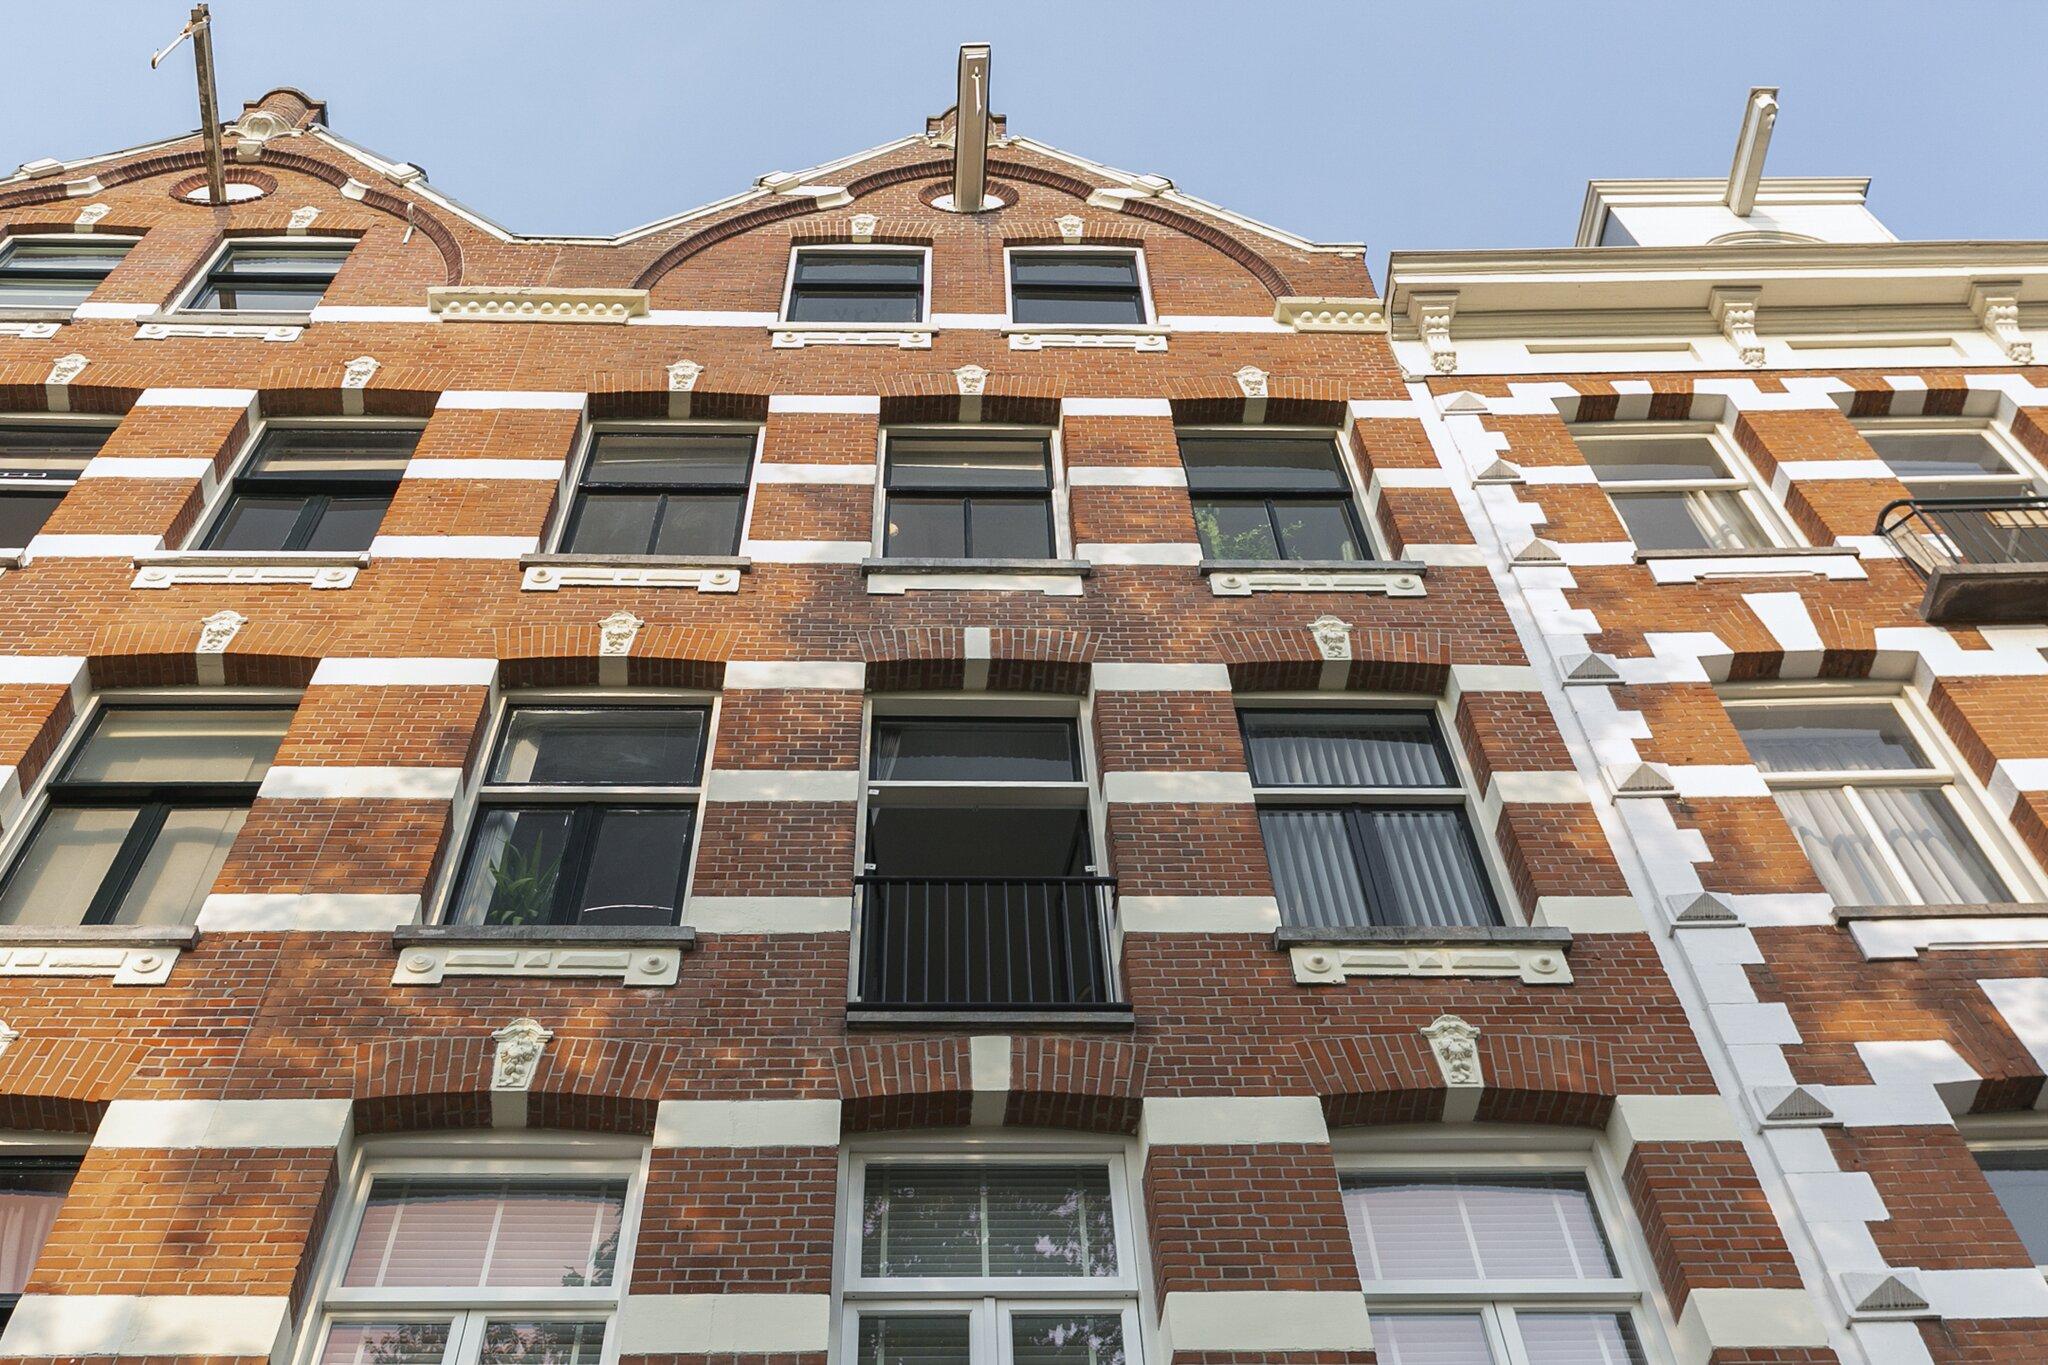 Amsterdam – Leidsekade 56-2 – Foto 30